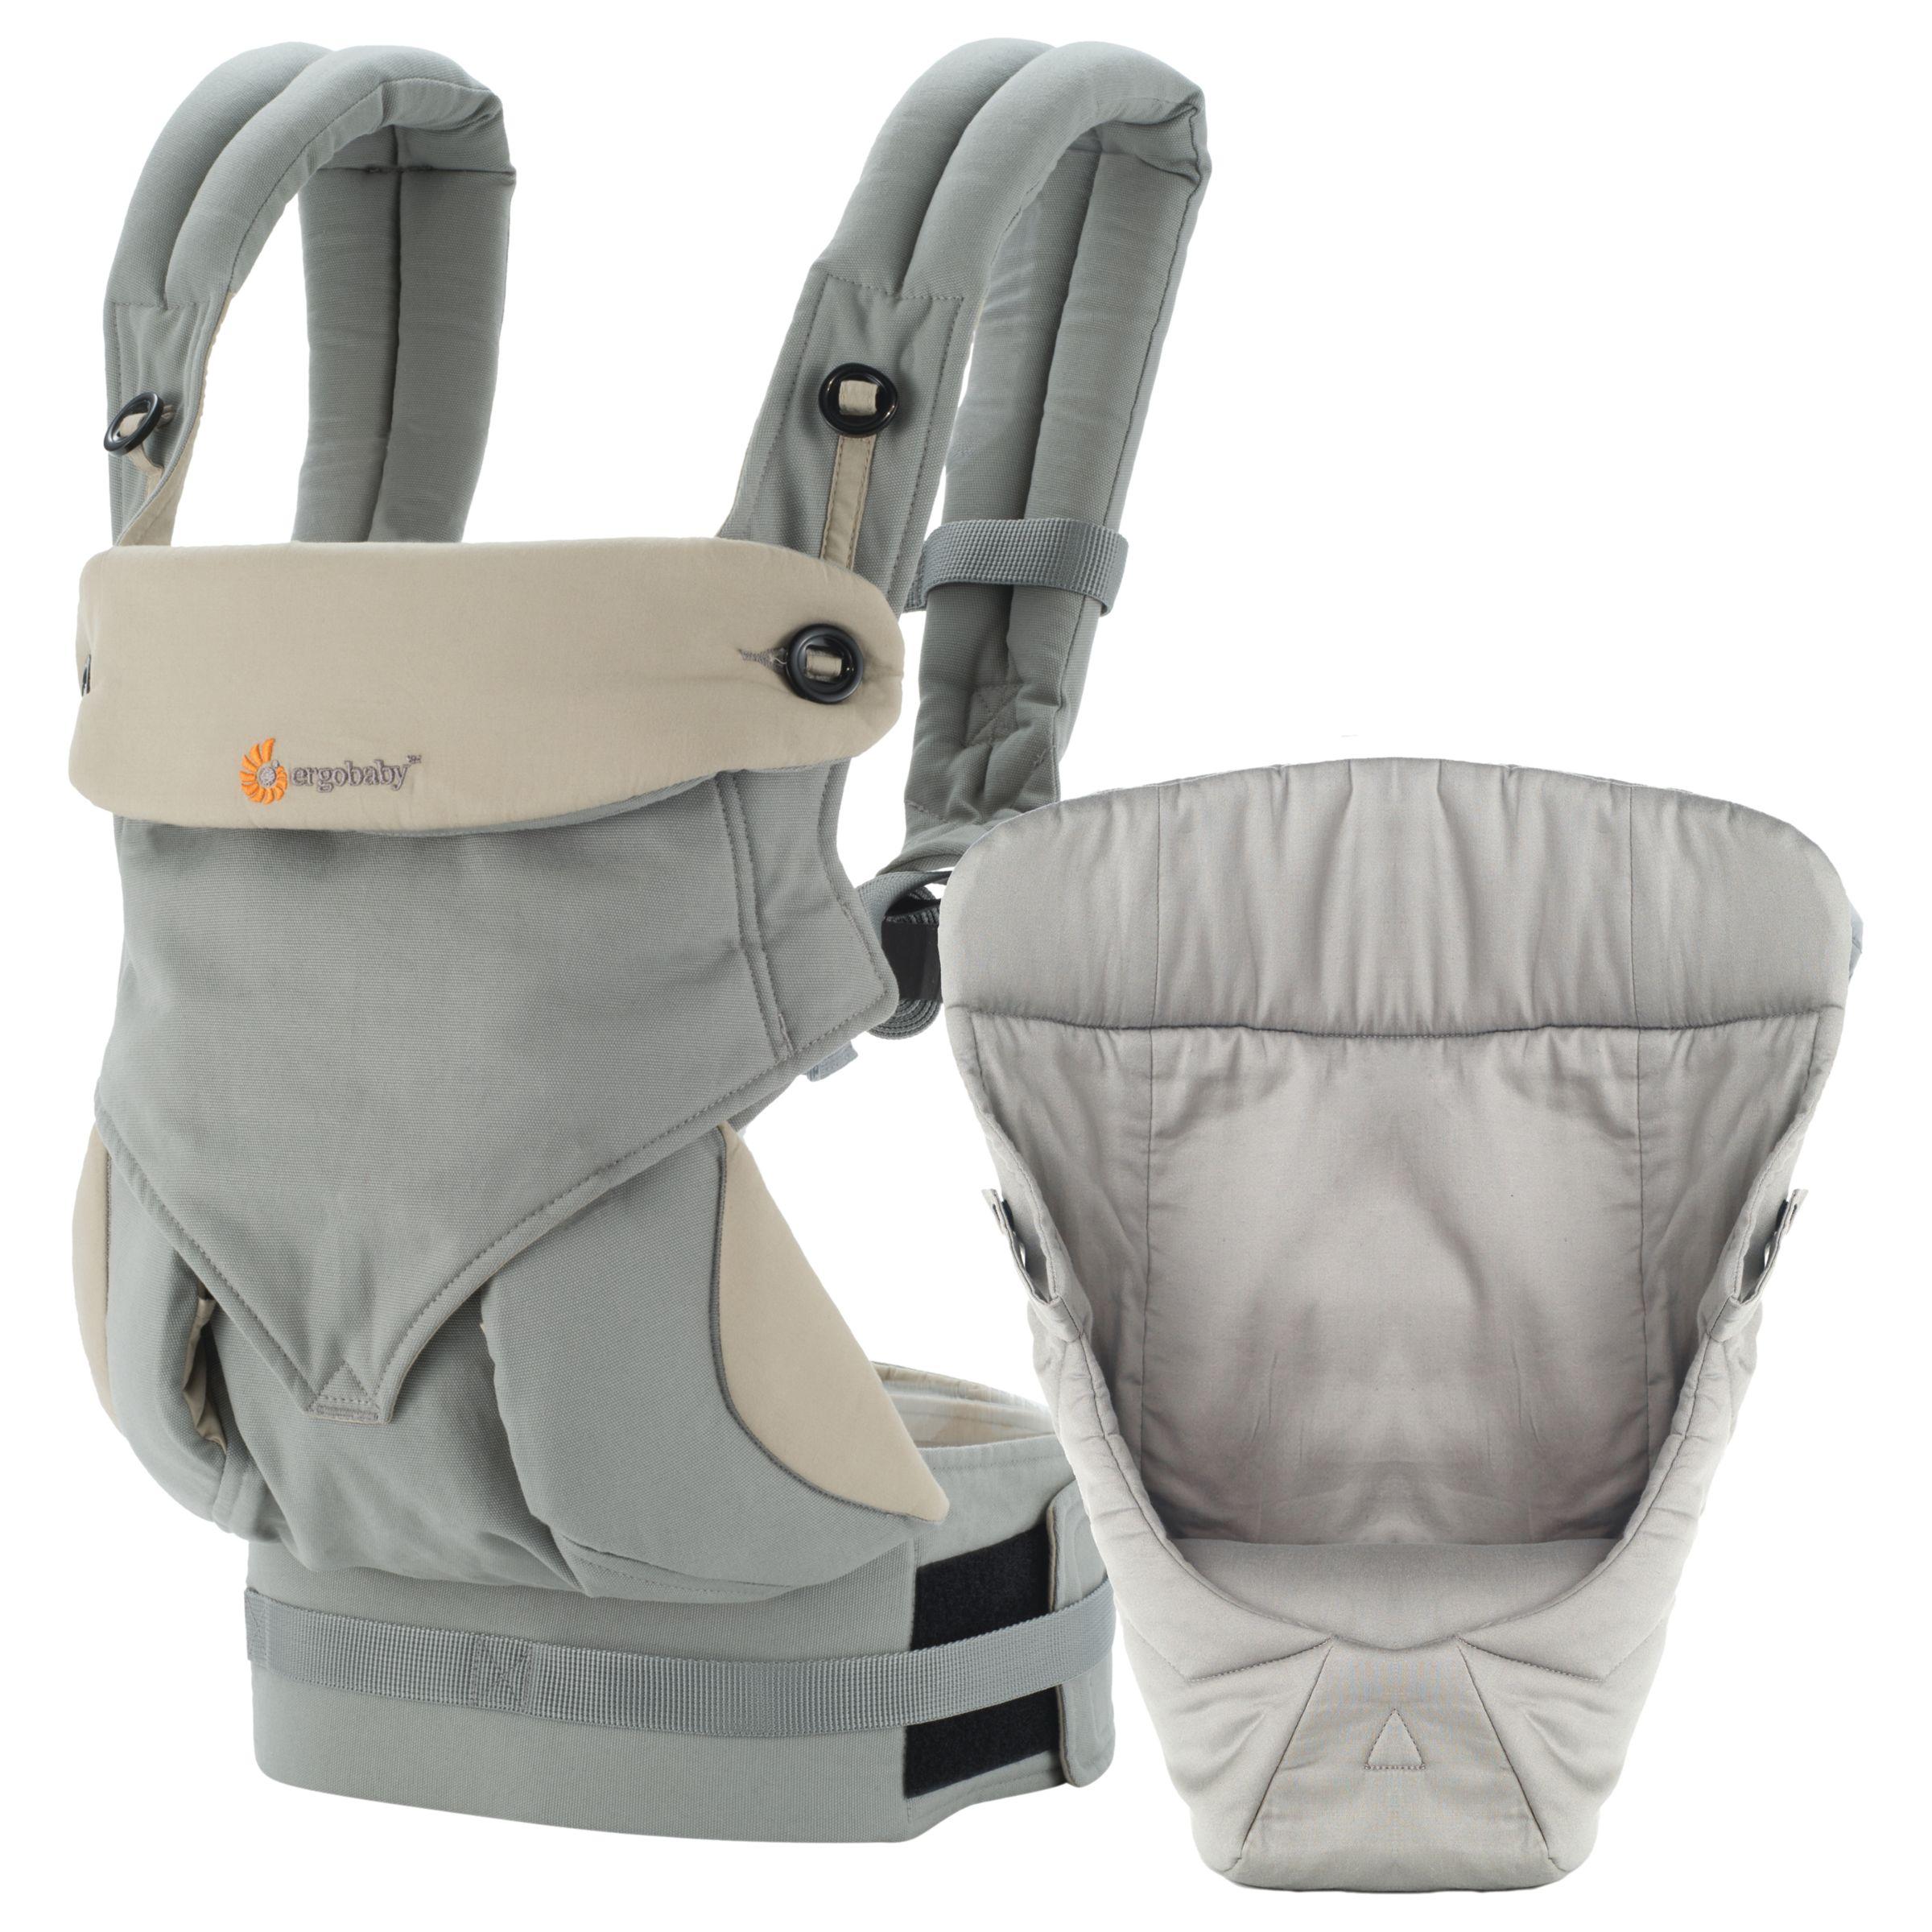 Ergobaby Ergobaby 360 Bundle of Joy Baby Carrier With Insert, Grey